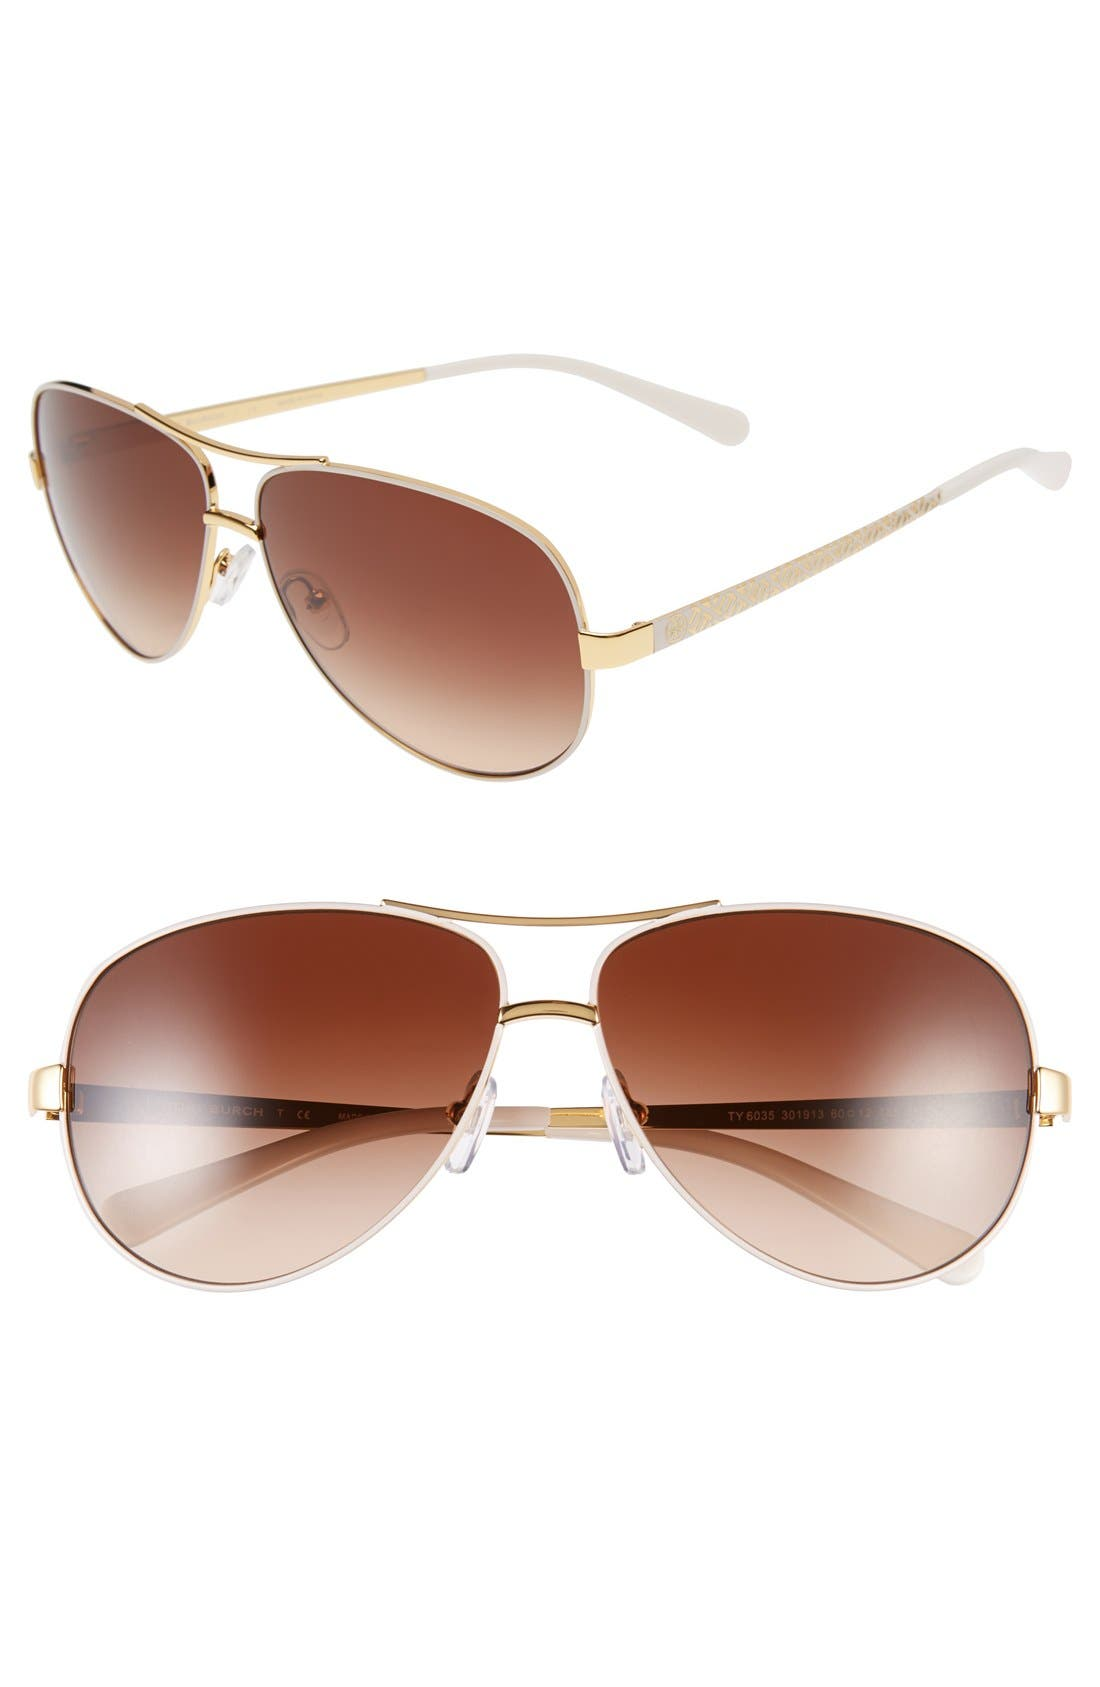 TORY BURCH, 60mm Aviator Sunglasses, Main thumbnail 1, color, IVORY GOLD